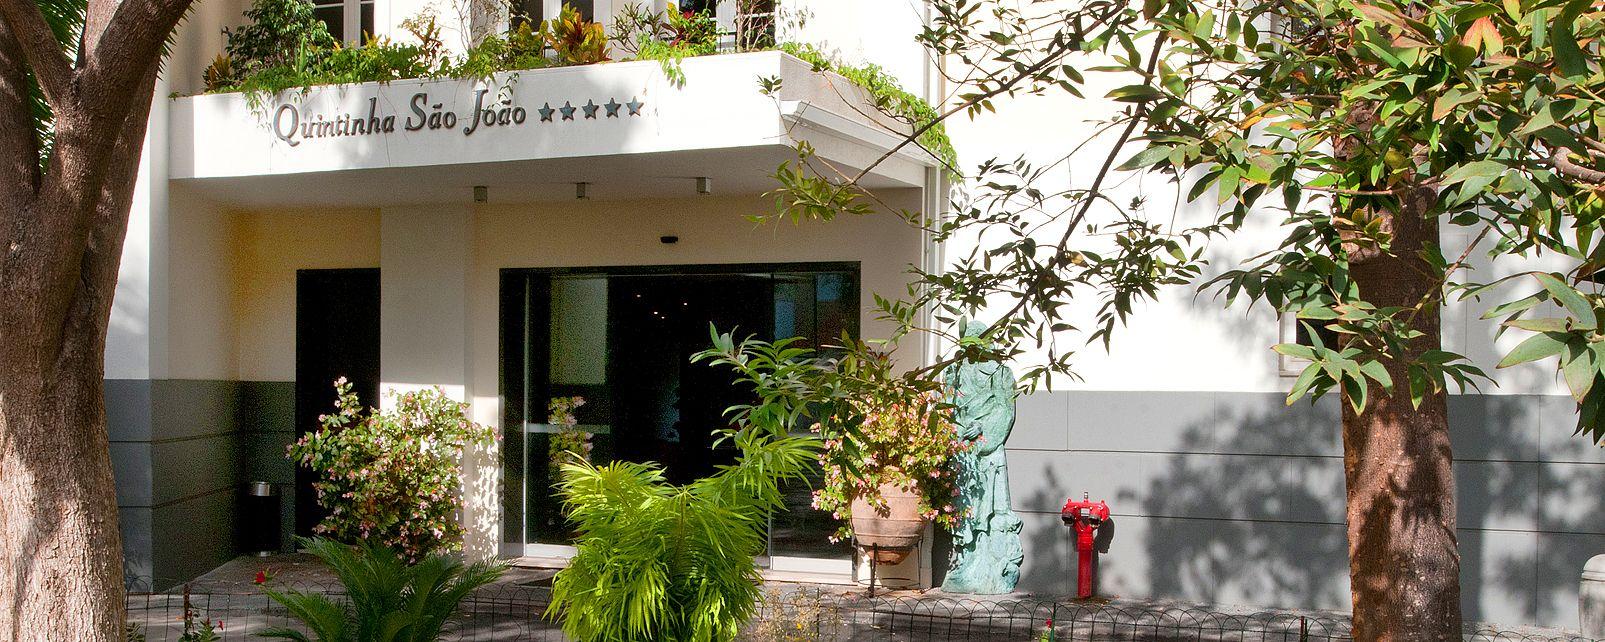 Hotel Quintinha de Sao Joao